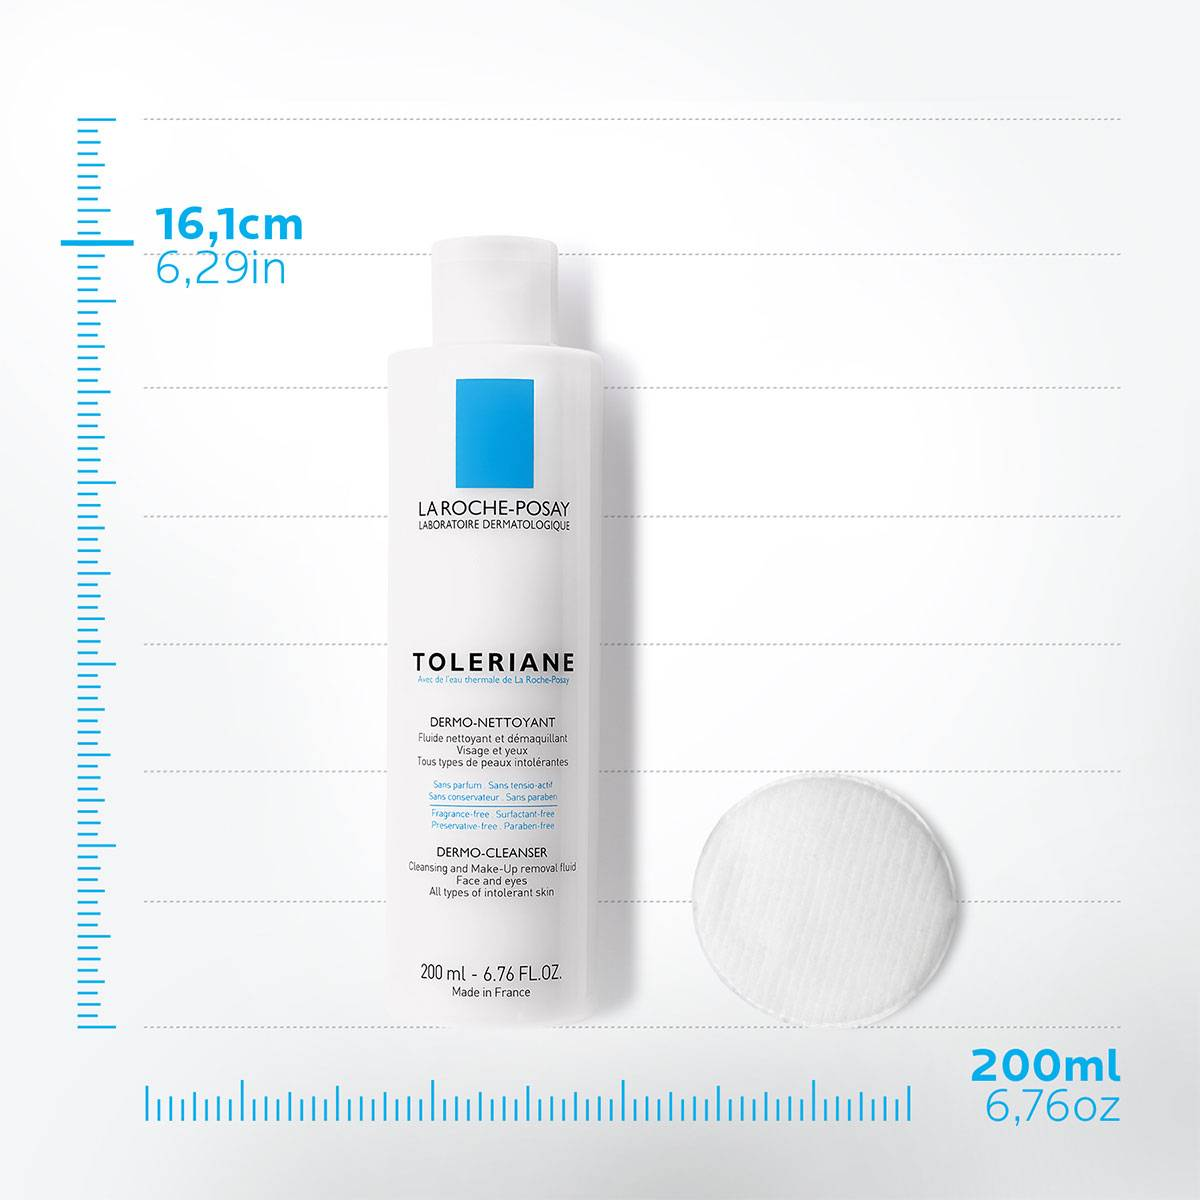 La Roche Posay ProduktSide Sensitiv Tendens til allergi Toleriane Dermo Rensevand